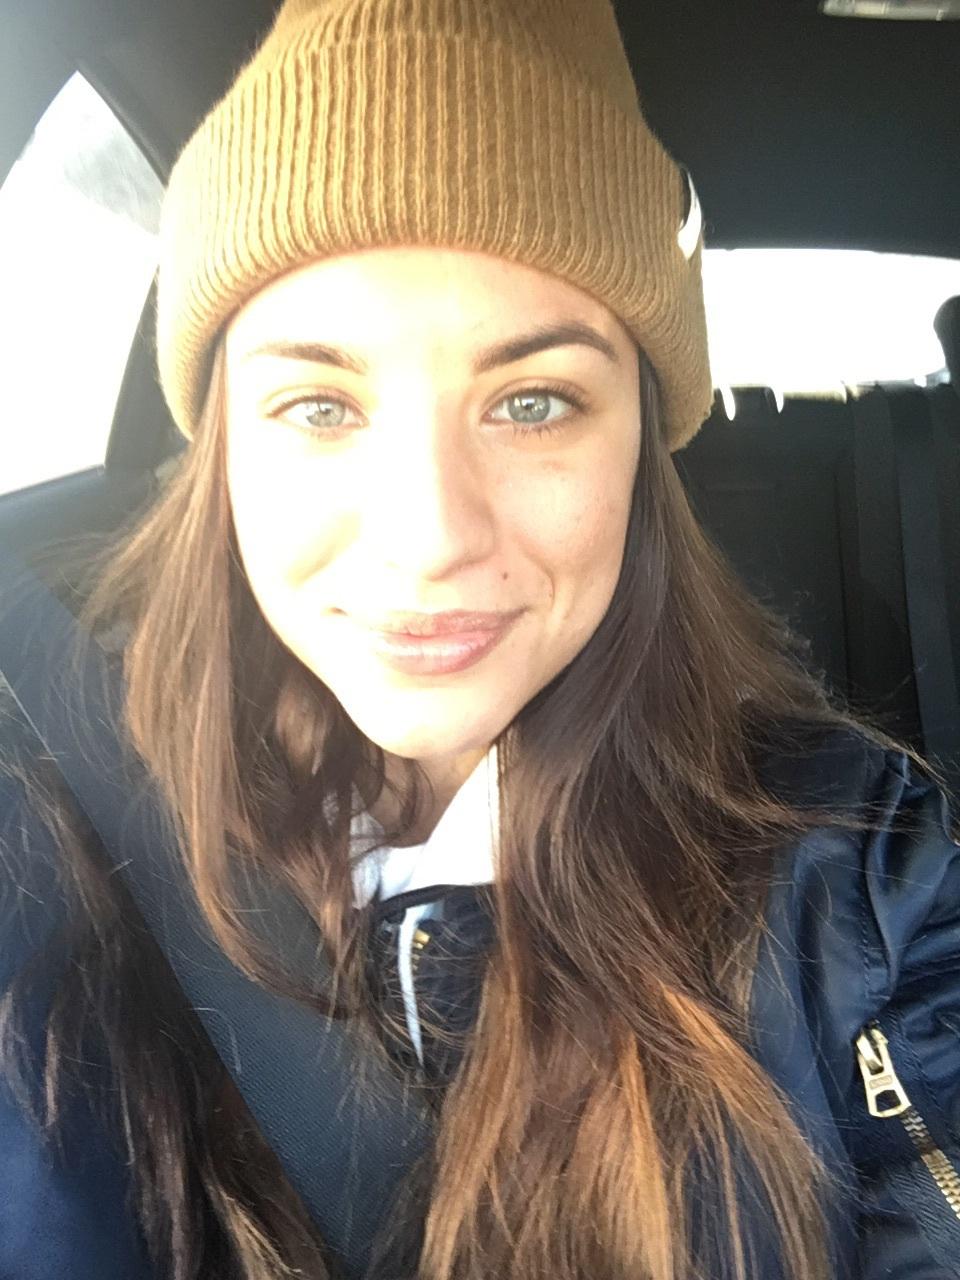 In the car enjoying a few rays of sun...